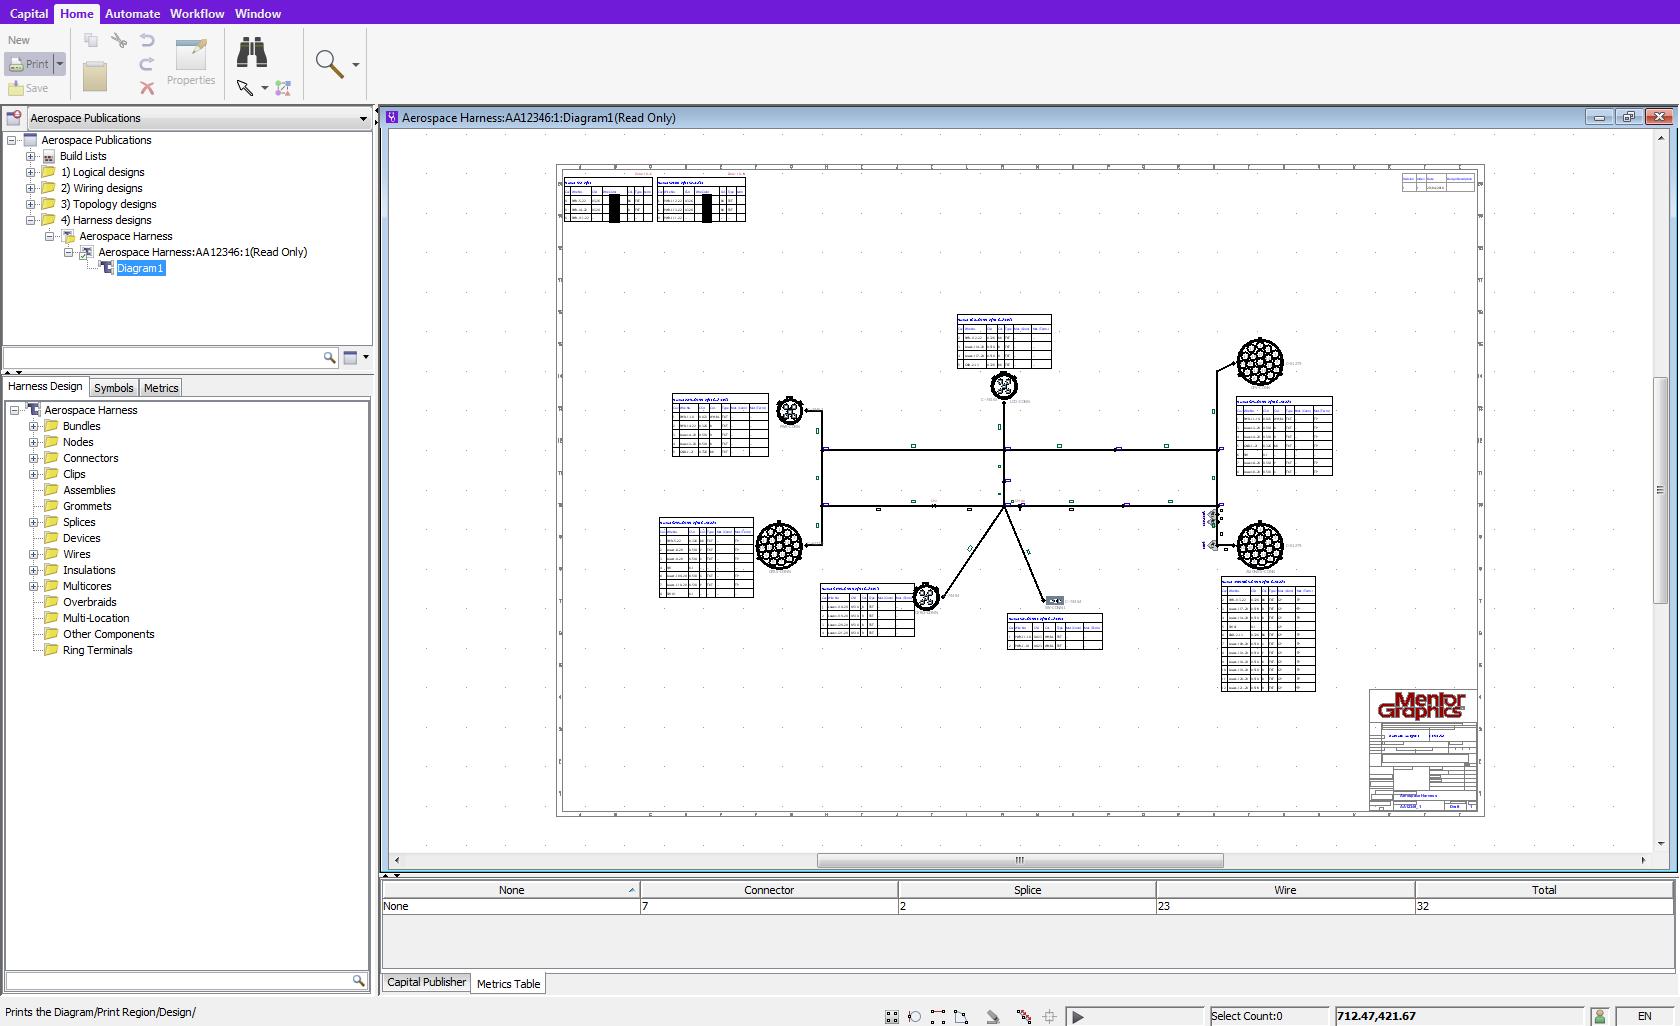 Automated Logic Mx400 Wiring Diagram Automotive Diagrams Rh 9 Ecker Leasing De Controls Aar